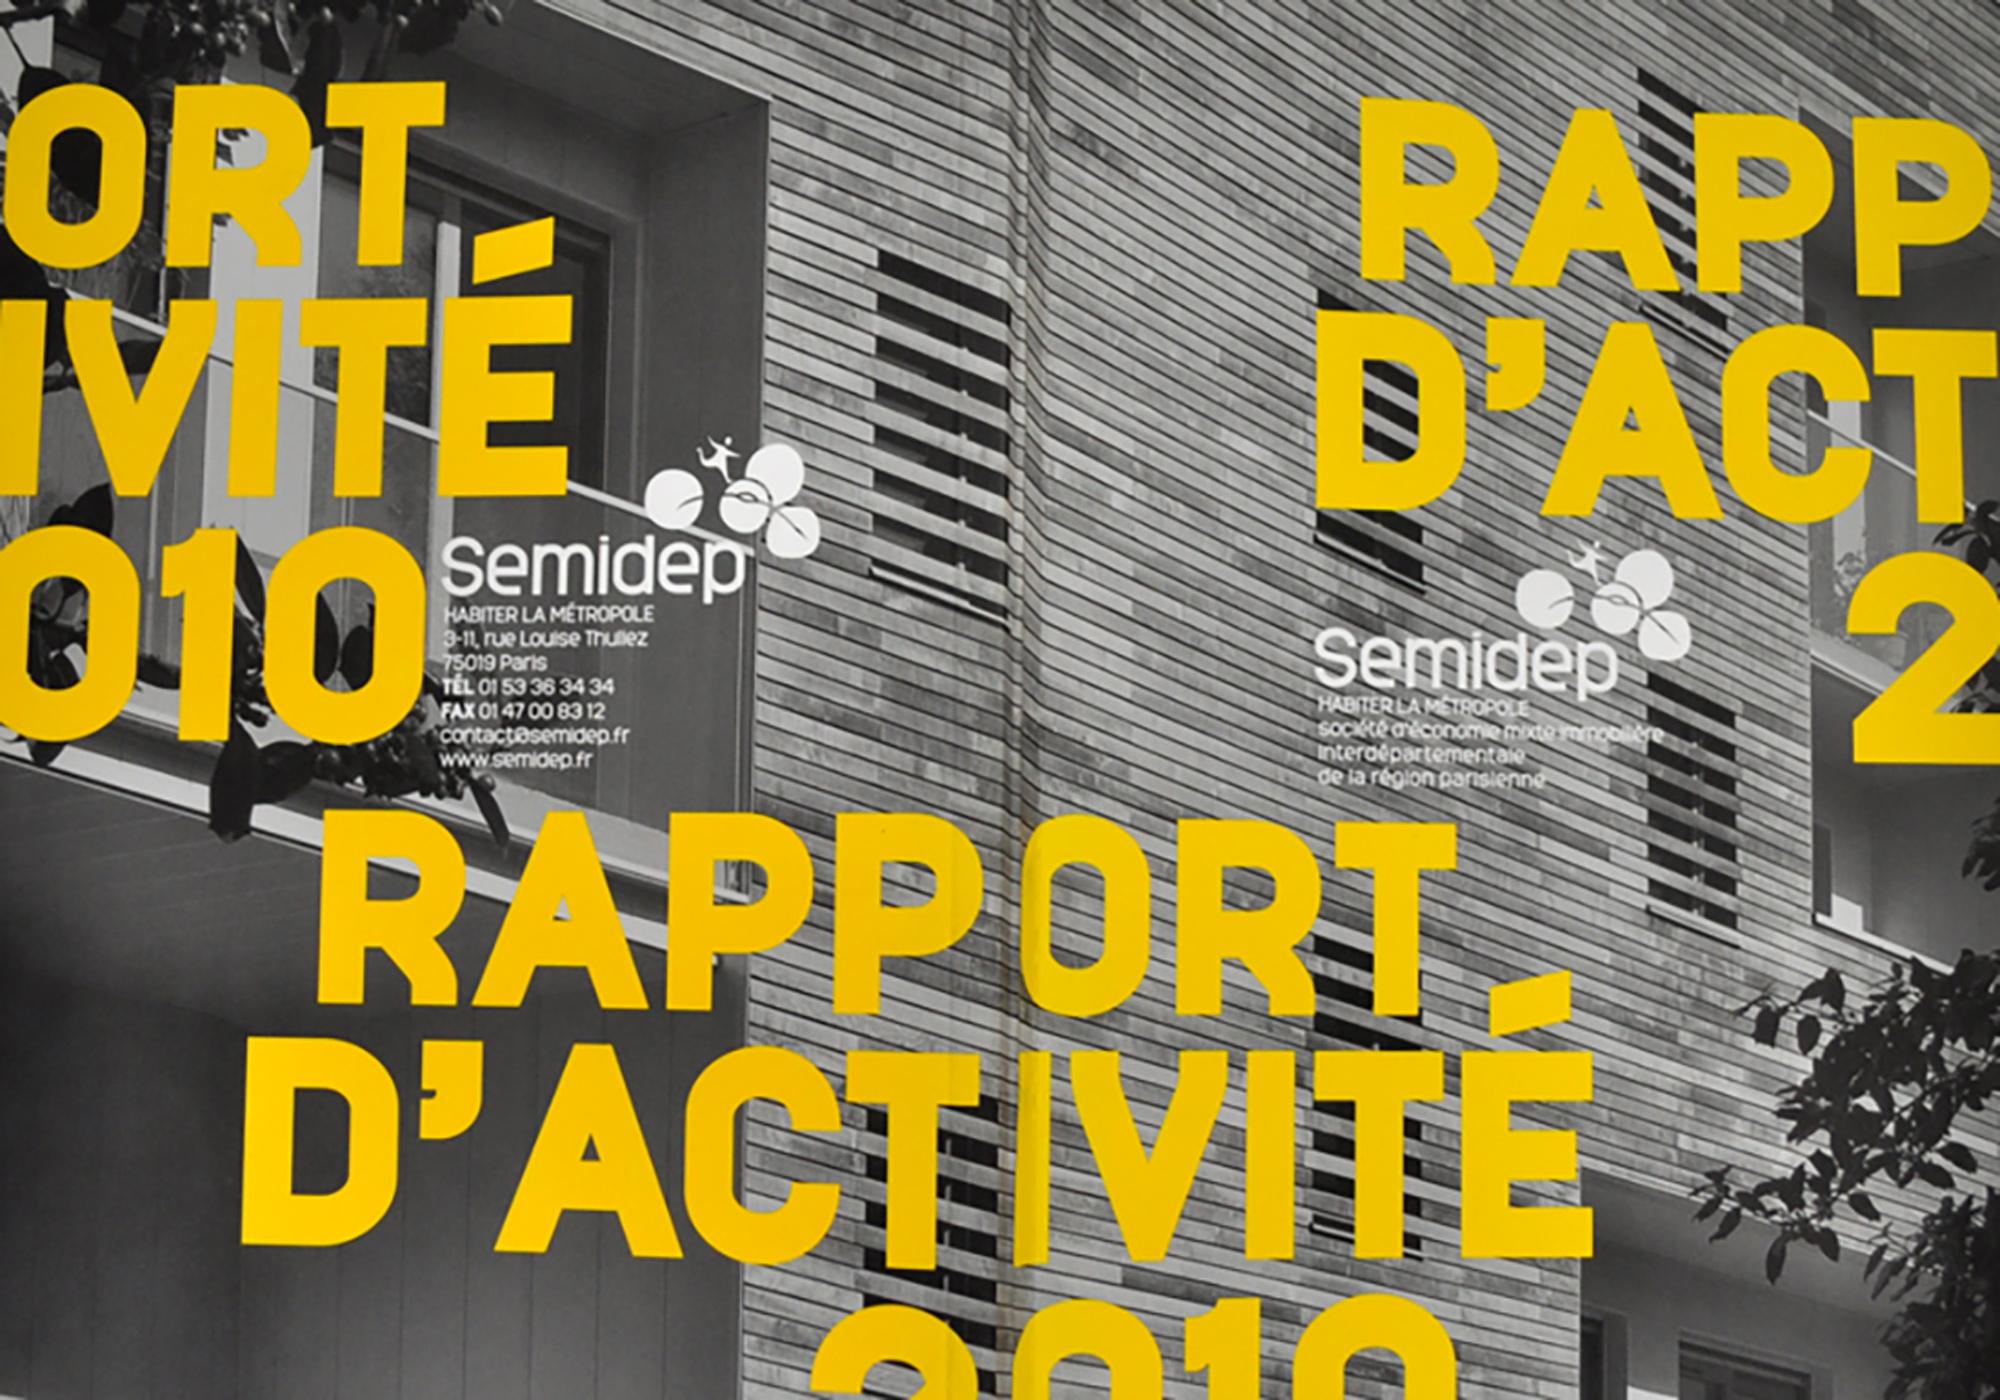 narrative rapport activite semidep